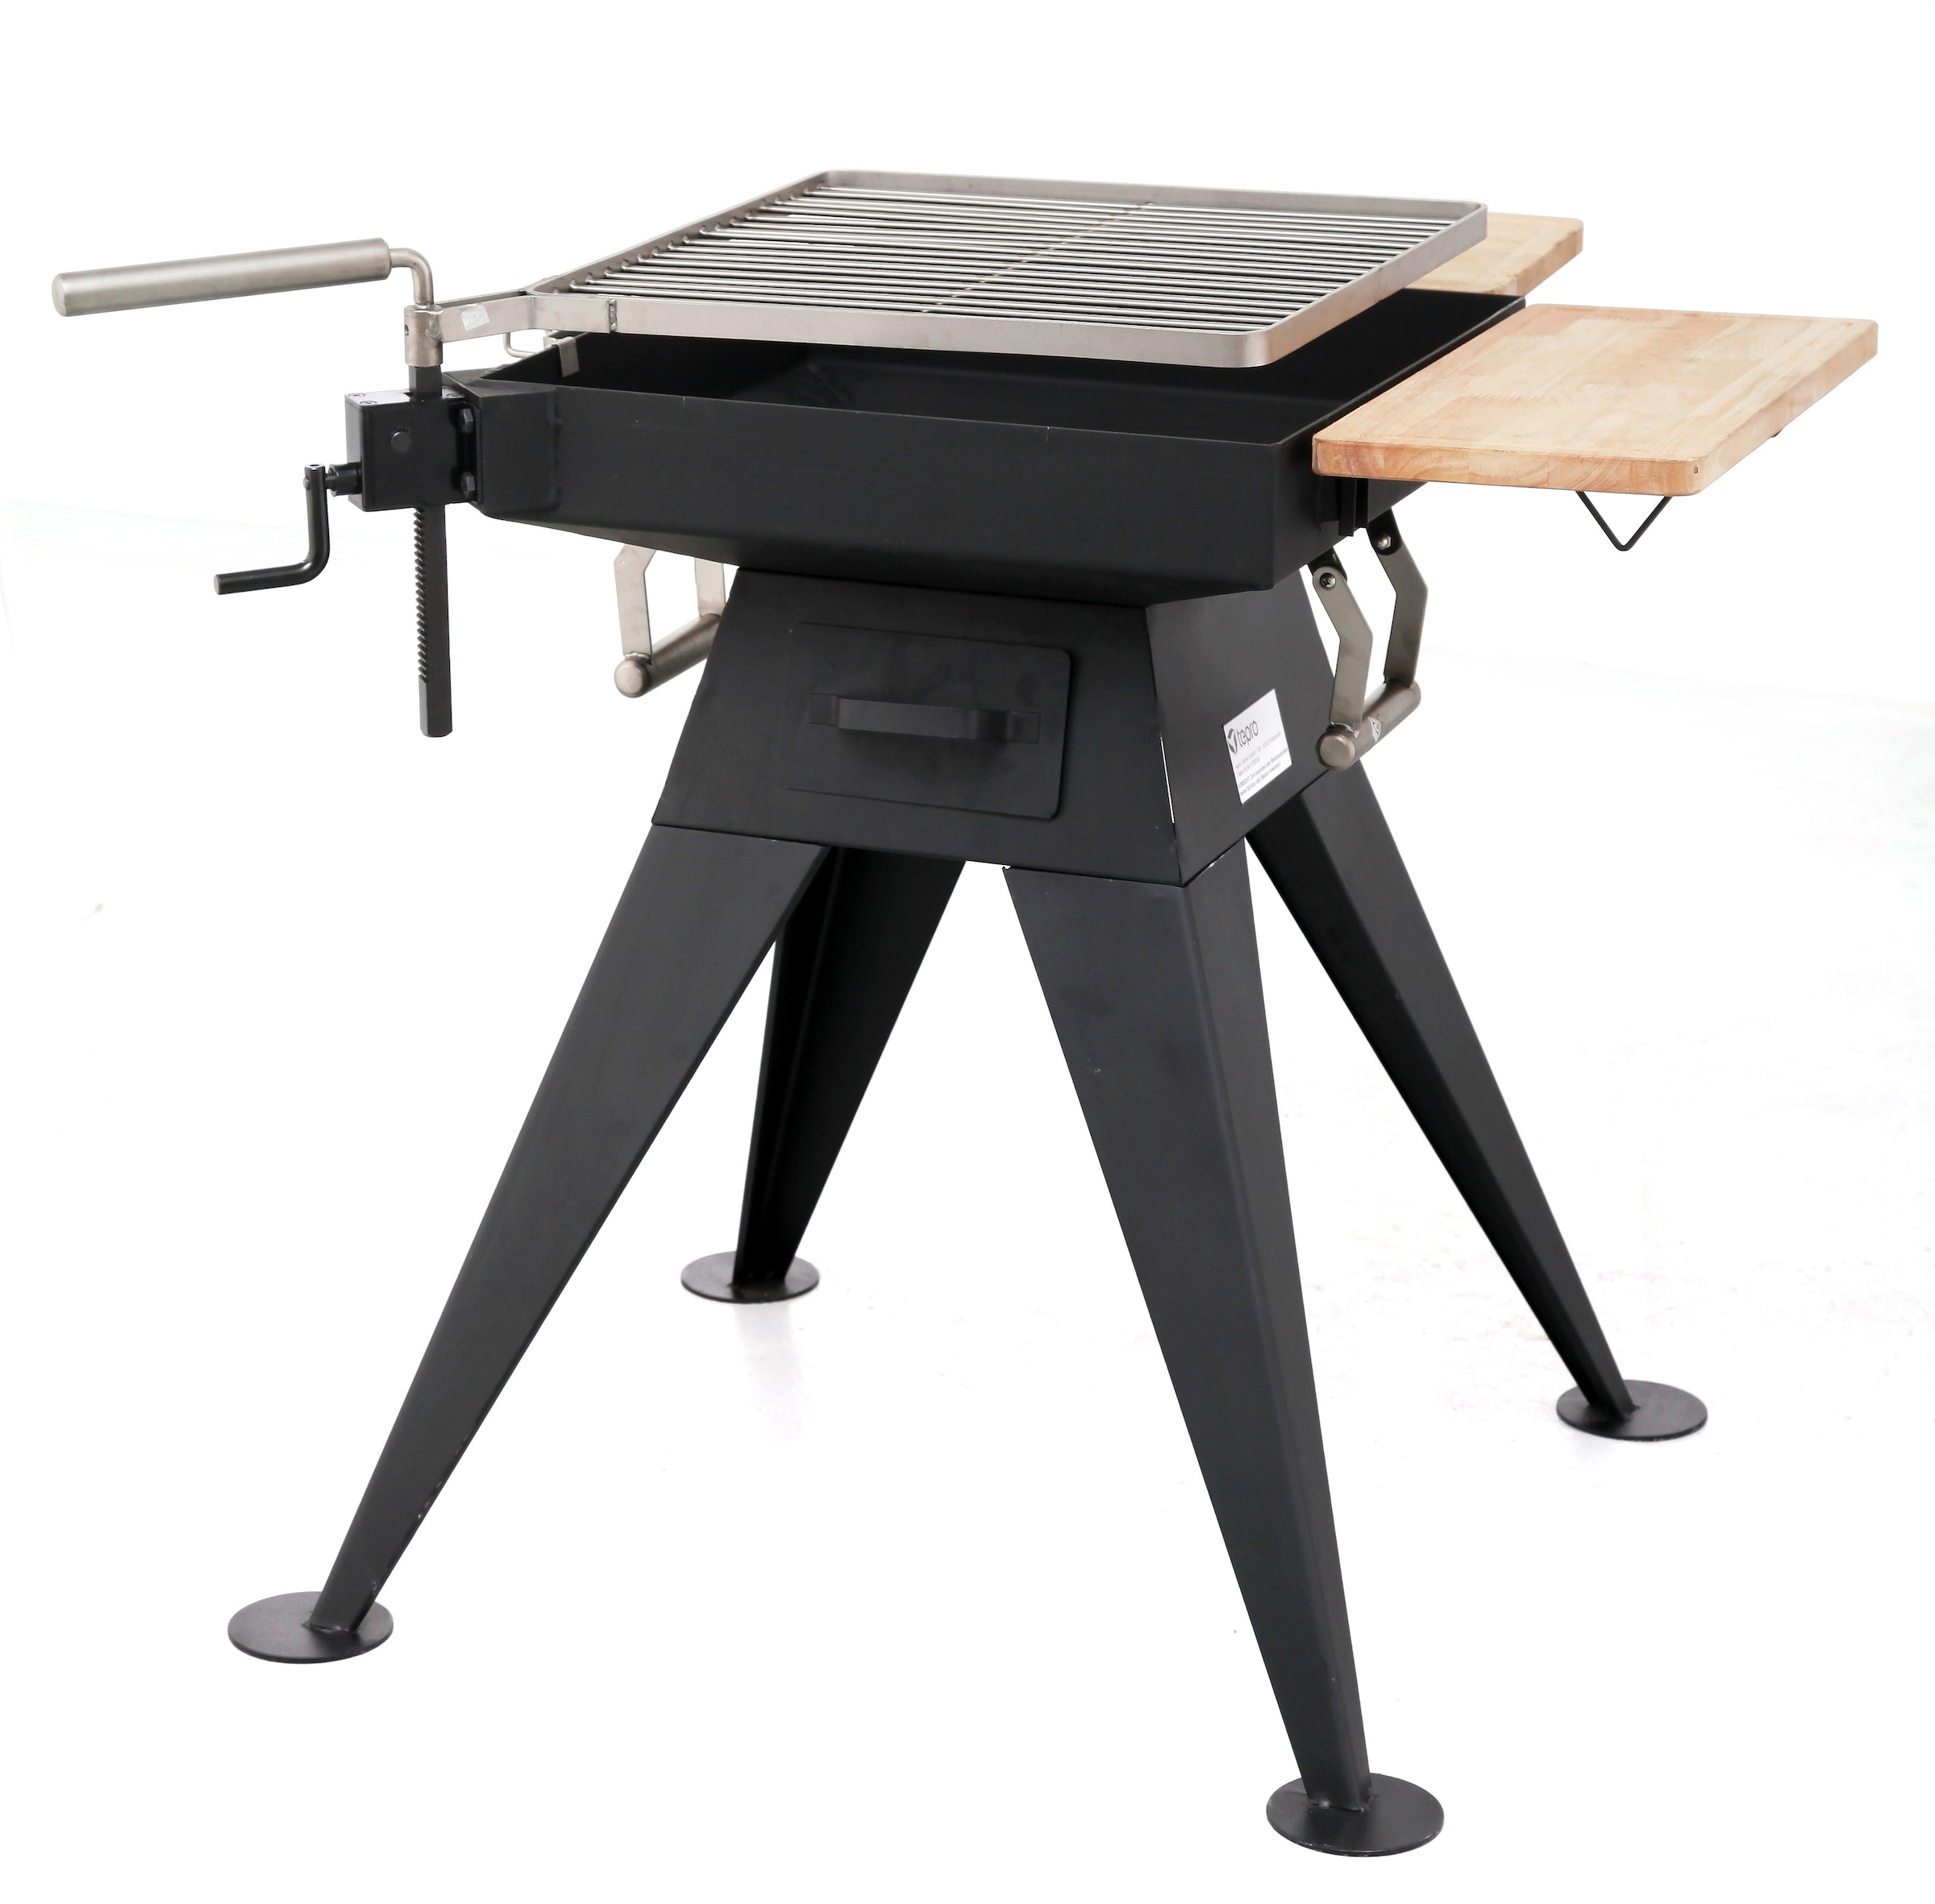 Tepro Holzkohlegrill Kaufen : Tepro chill grill lambada te ab u ac preisvergleich